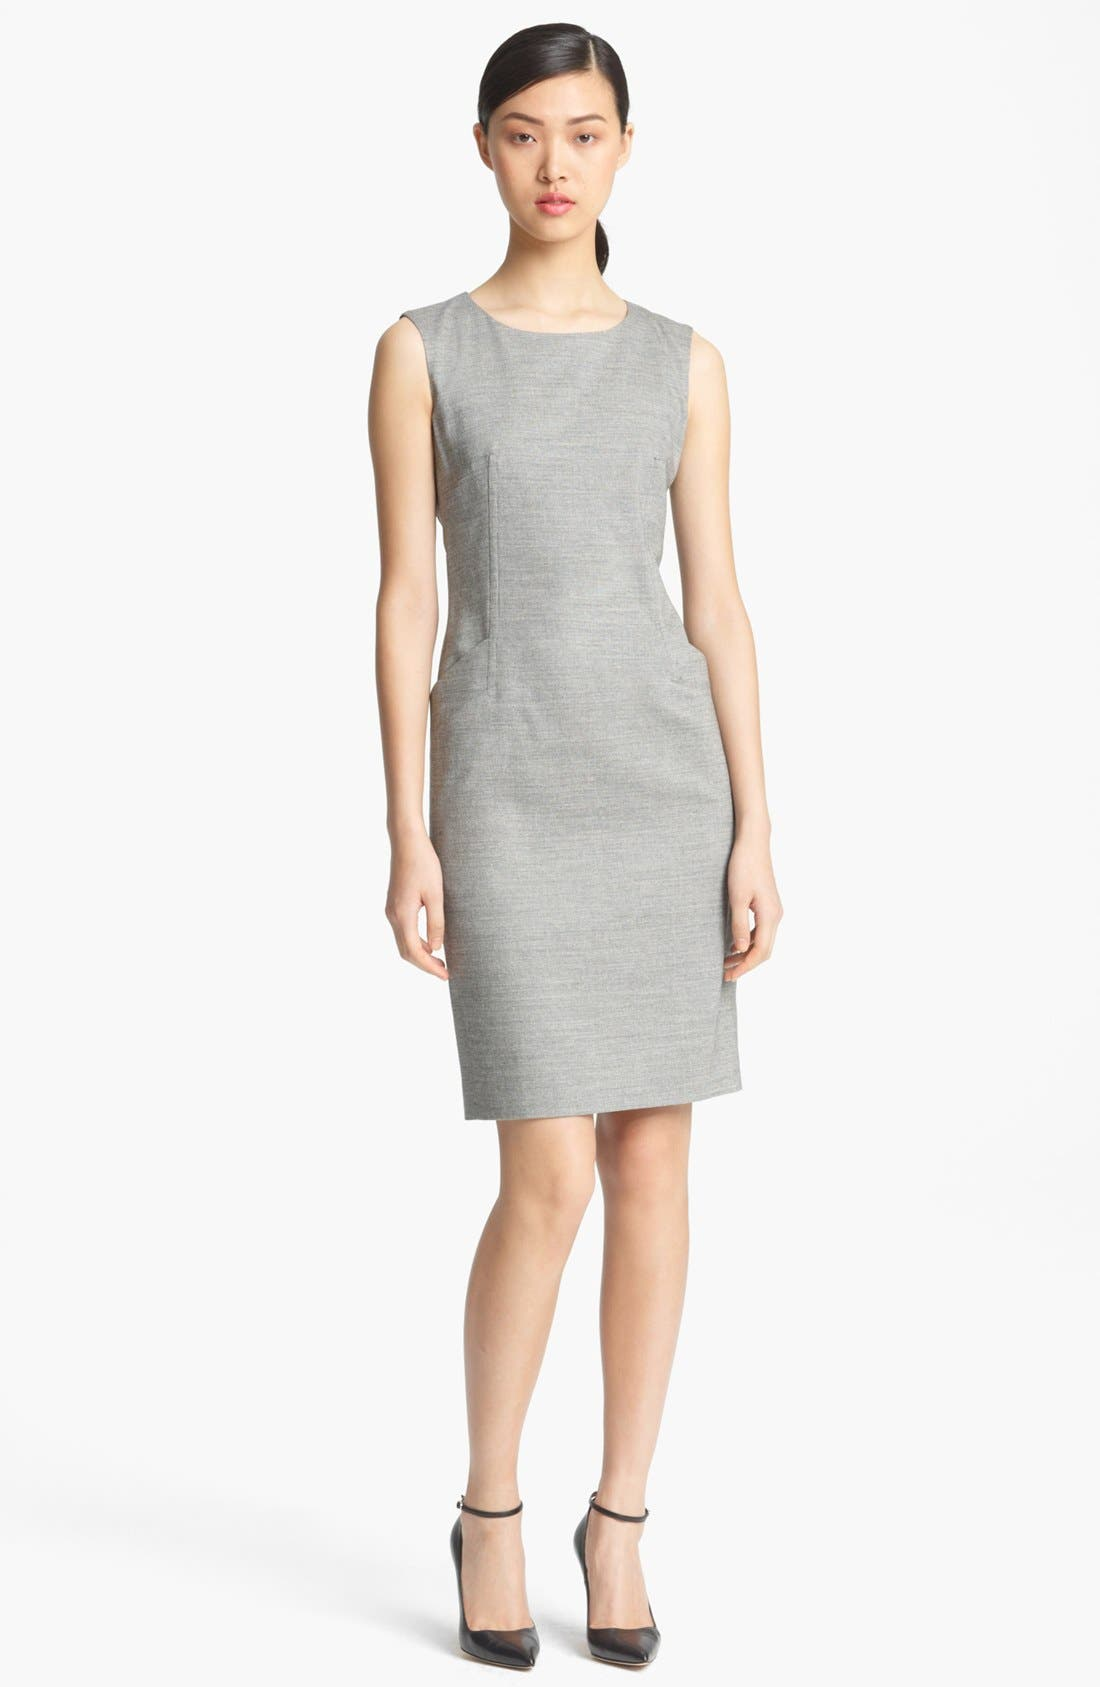 Alternate Image 1 Selected - Max Mara 'Albi' Sleeveless Dress